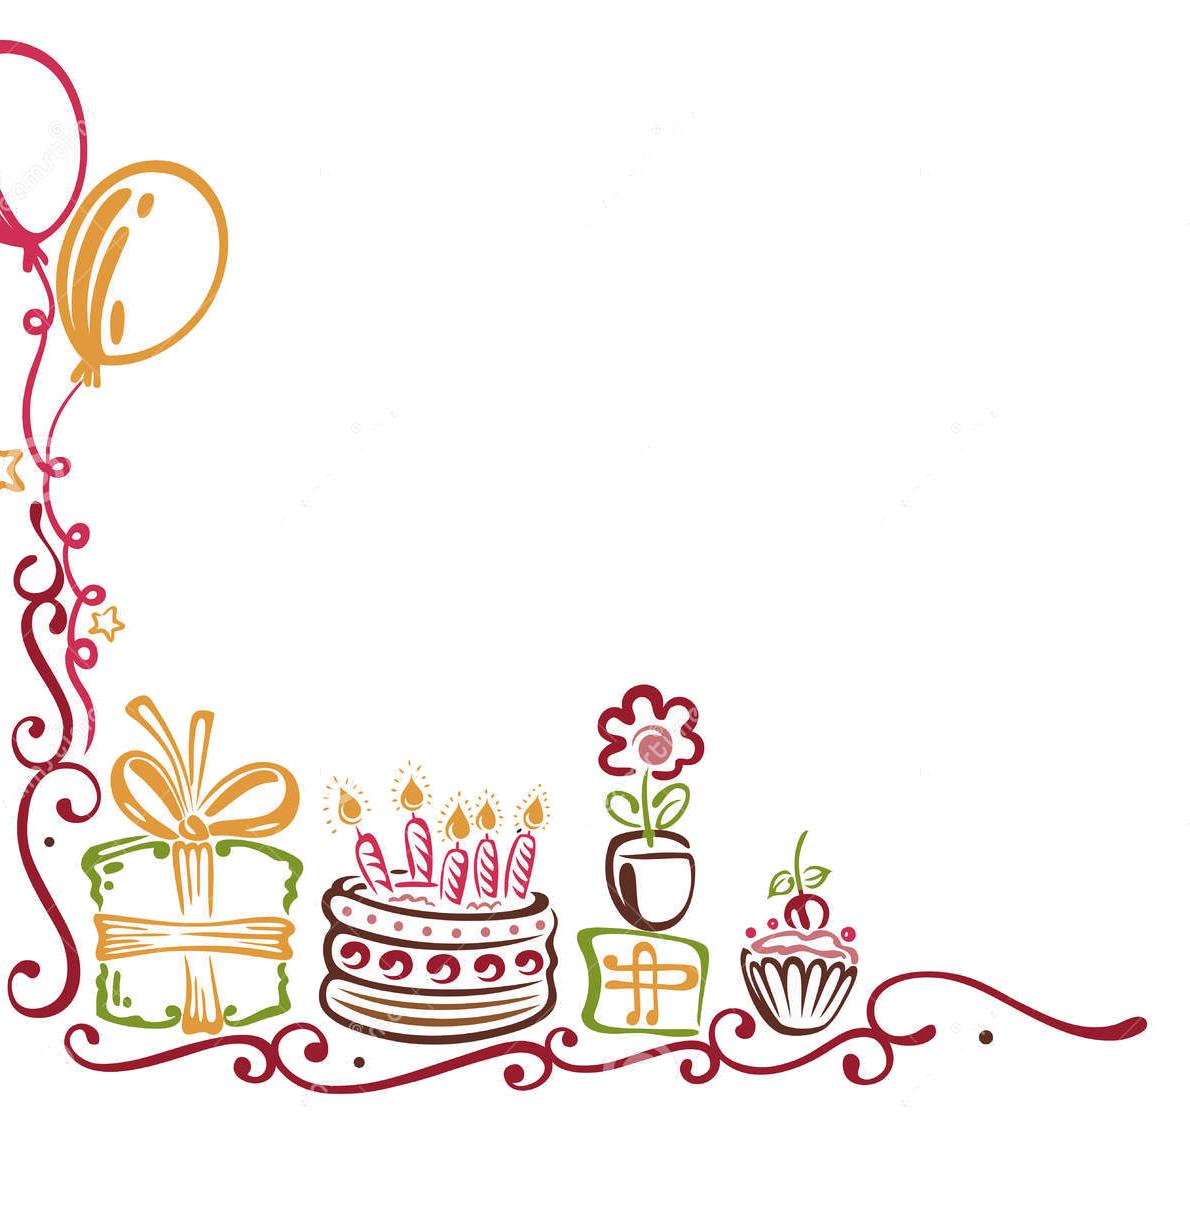 Birthday cake Party Happy Birthday to You Clip art.